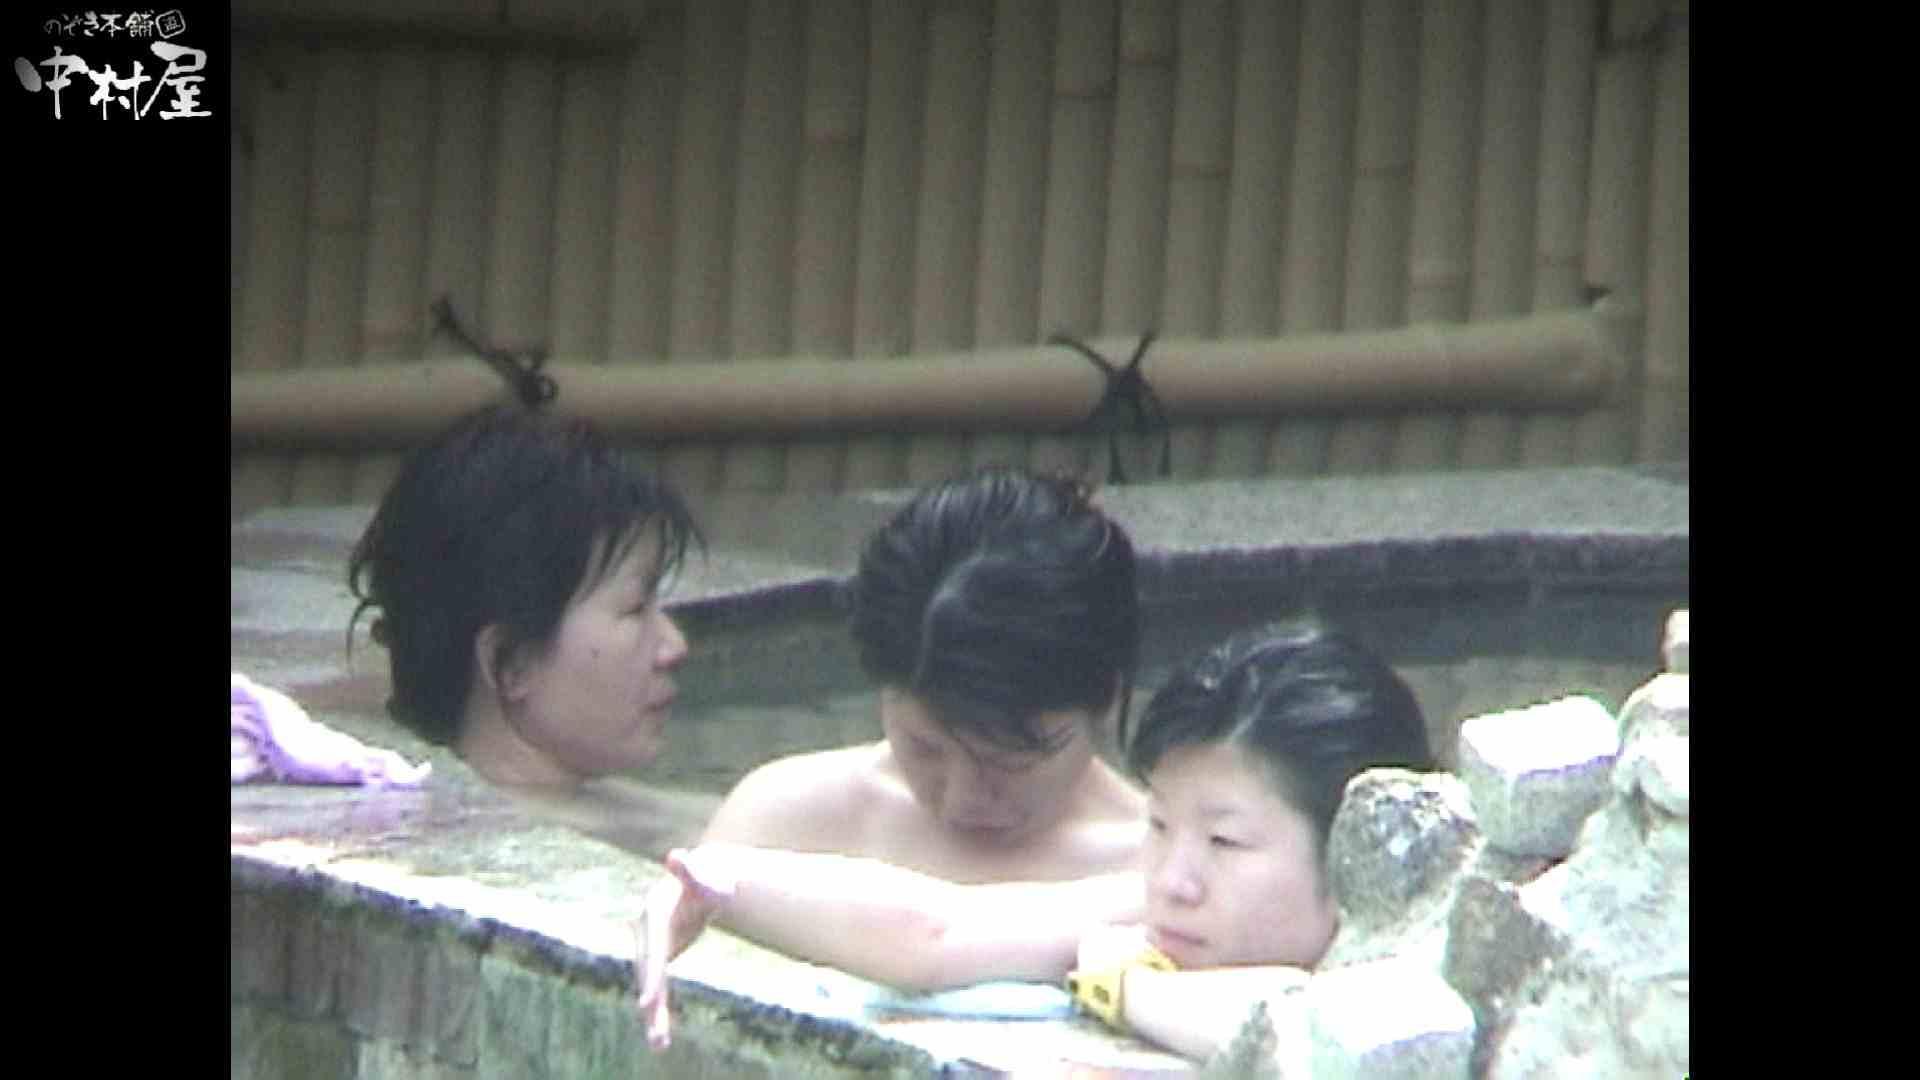 Aquaな露天風呂Vol.936 盗撮映像  110Pix 73